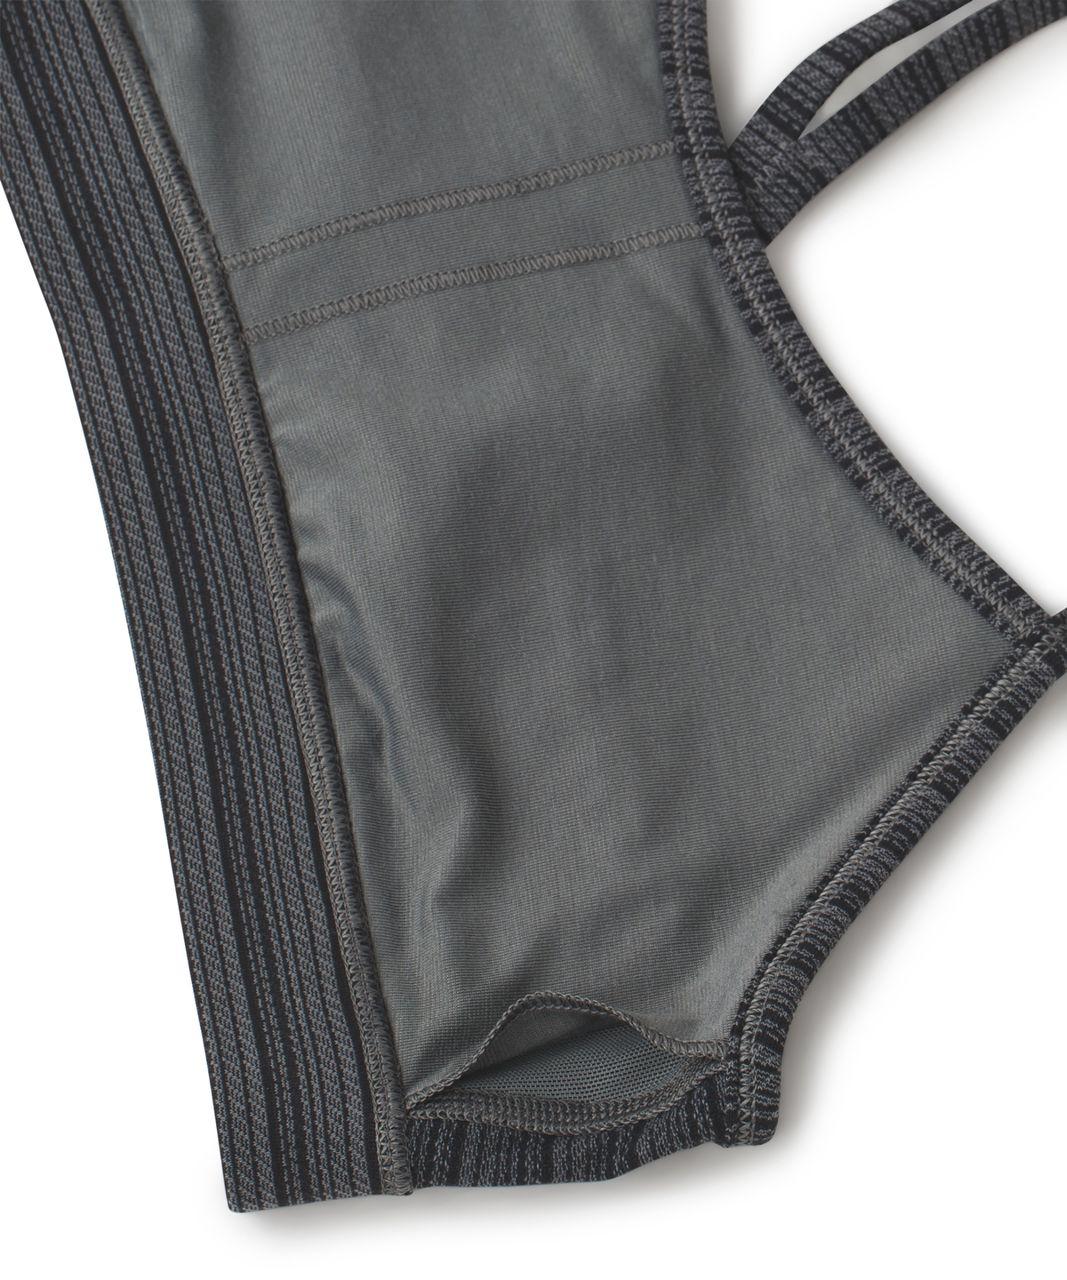 Lululemon Flow Y Bra IV - Textured Stripe Slate Deep Coal